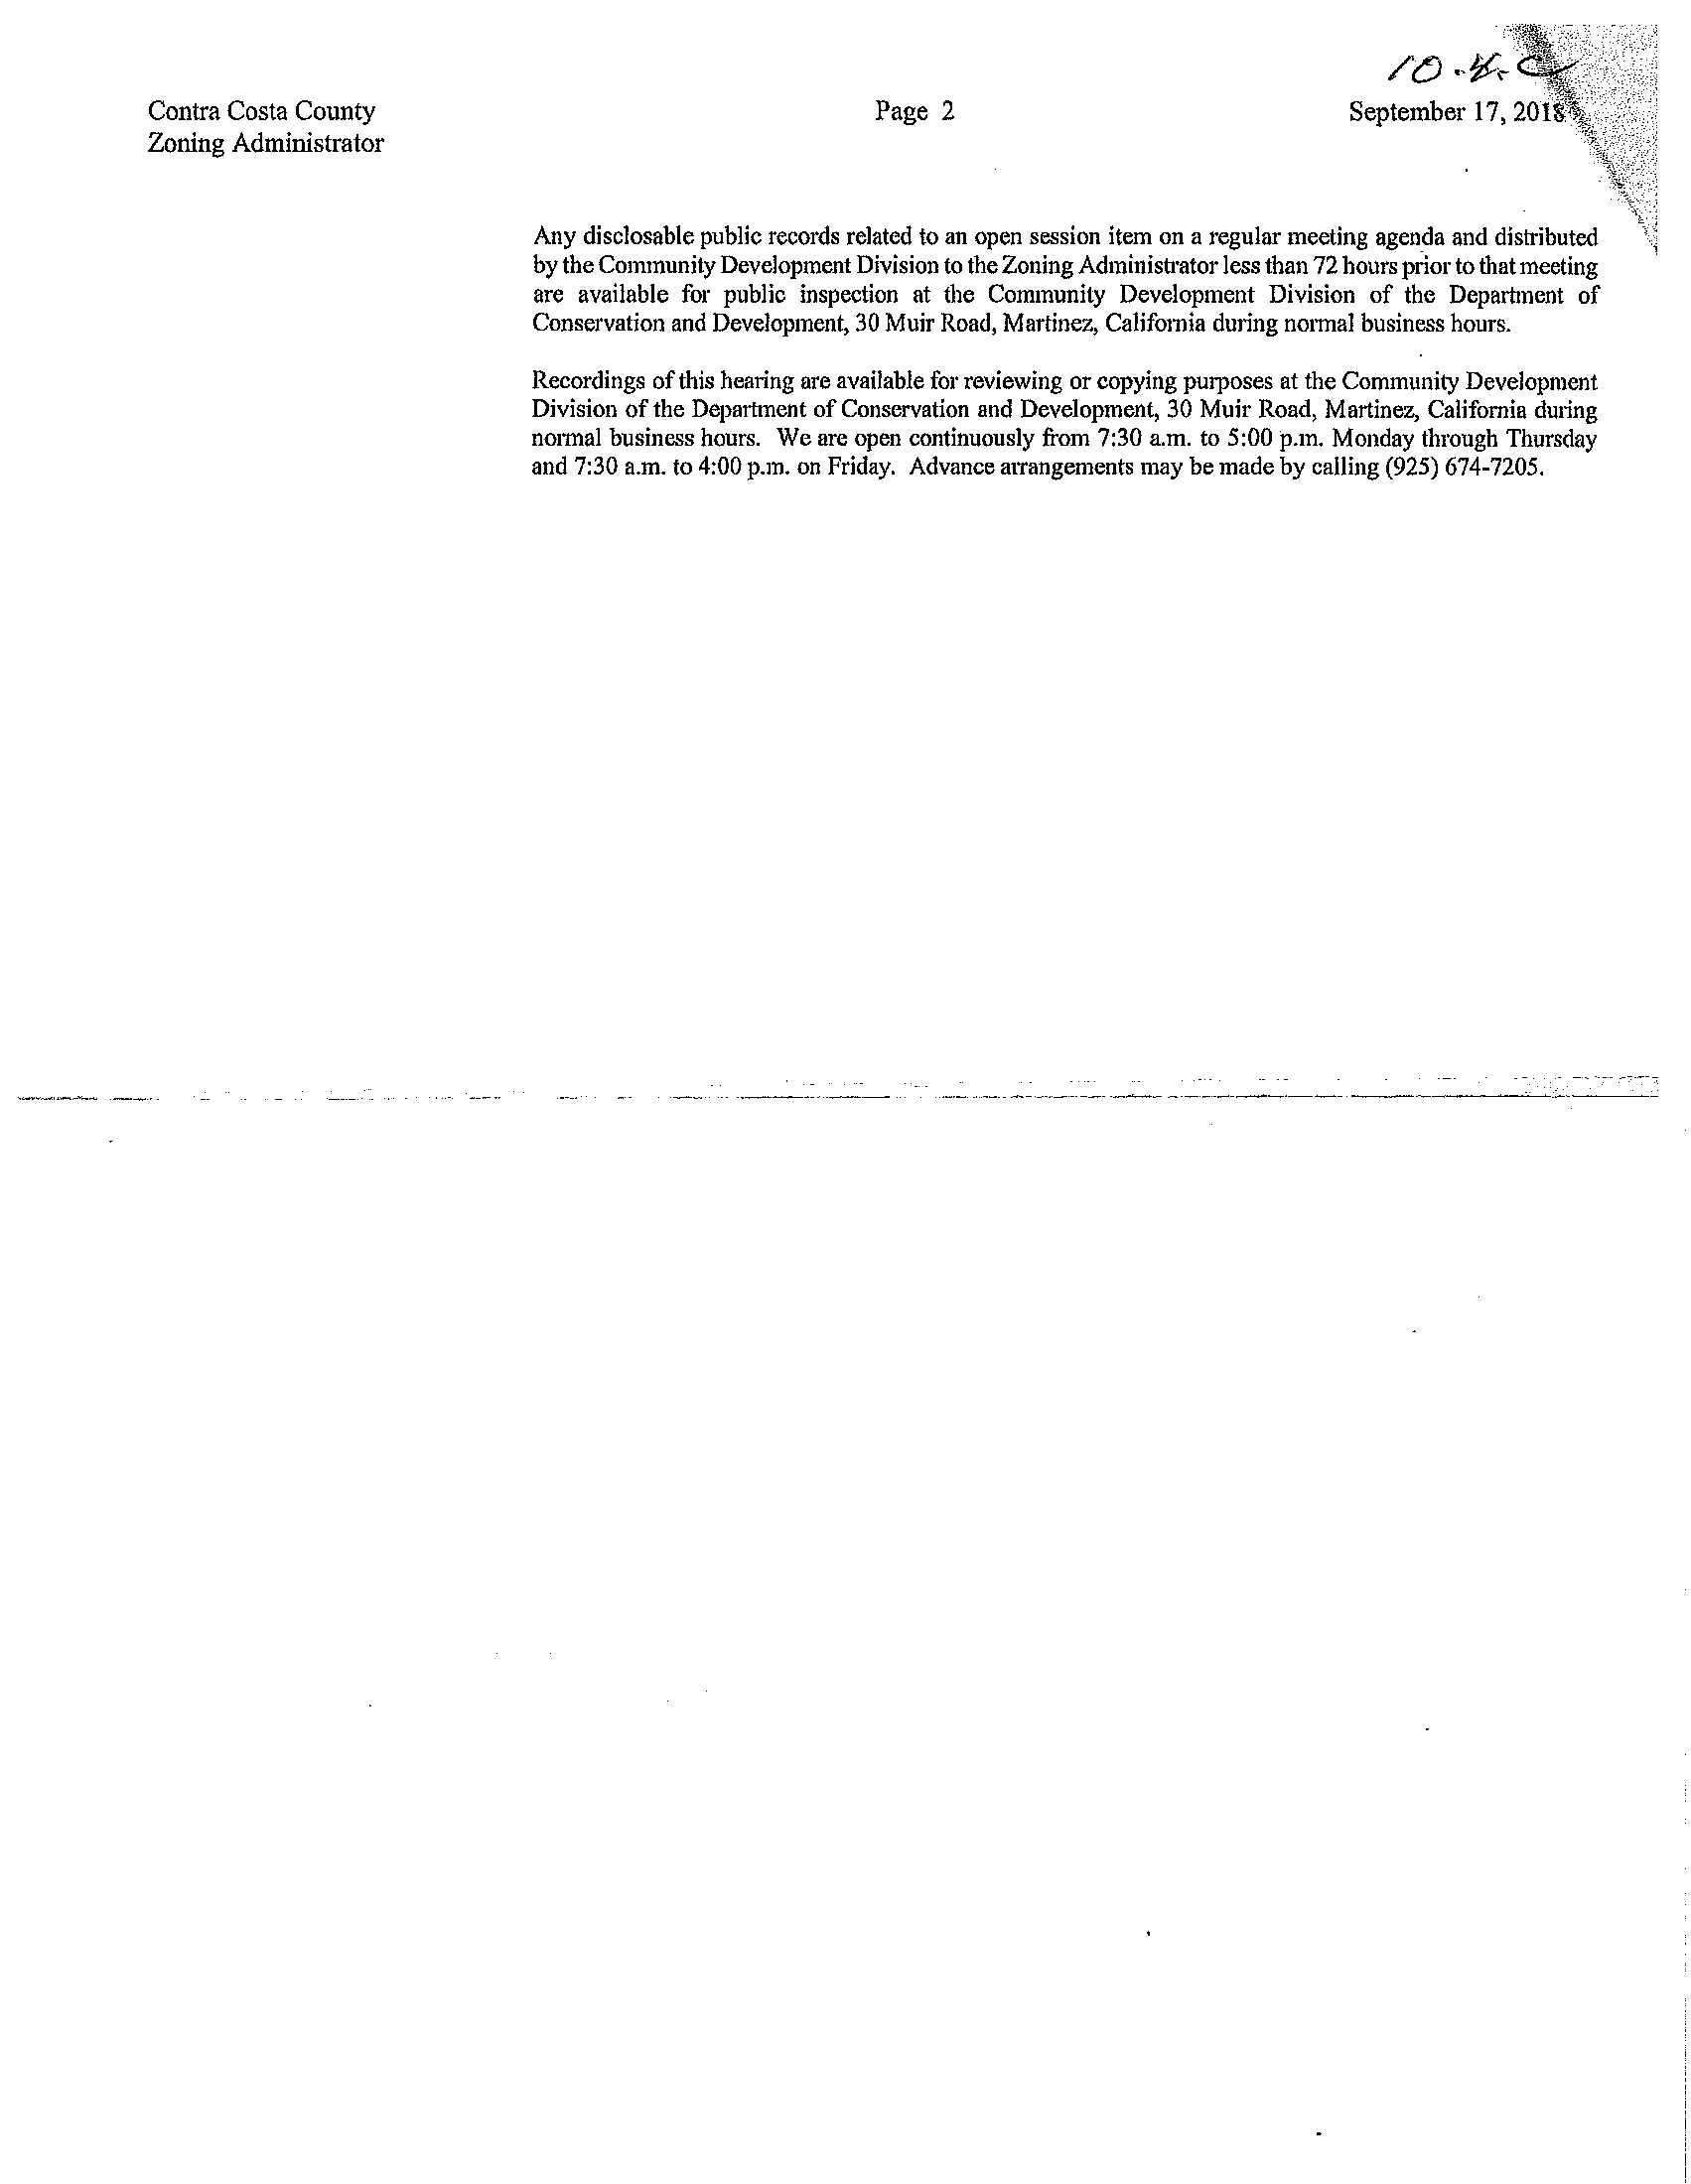 ESMAC Agenda 10.10.2018 (32 Pages)_28.jpg